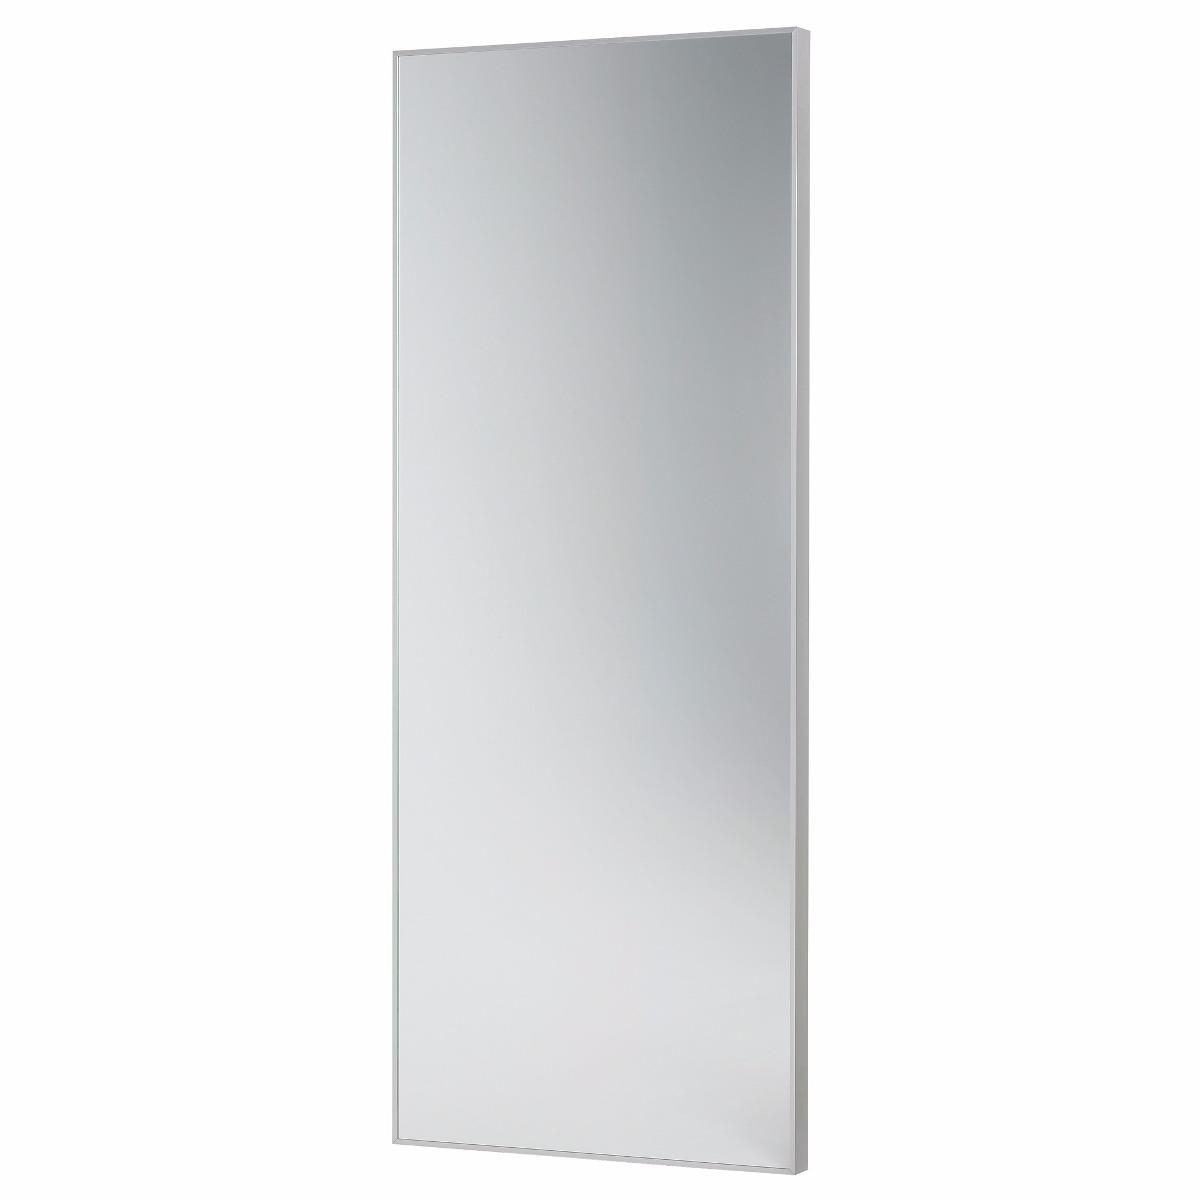 Espejos grandes espejos grandes para vestidor espejo for Espejo rectangular grande